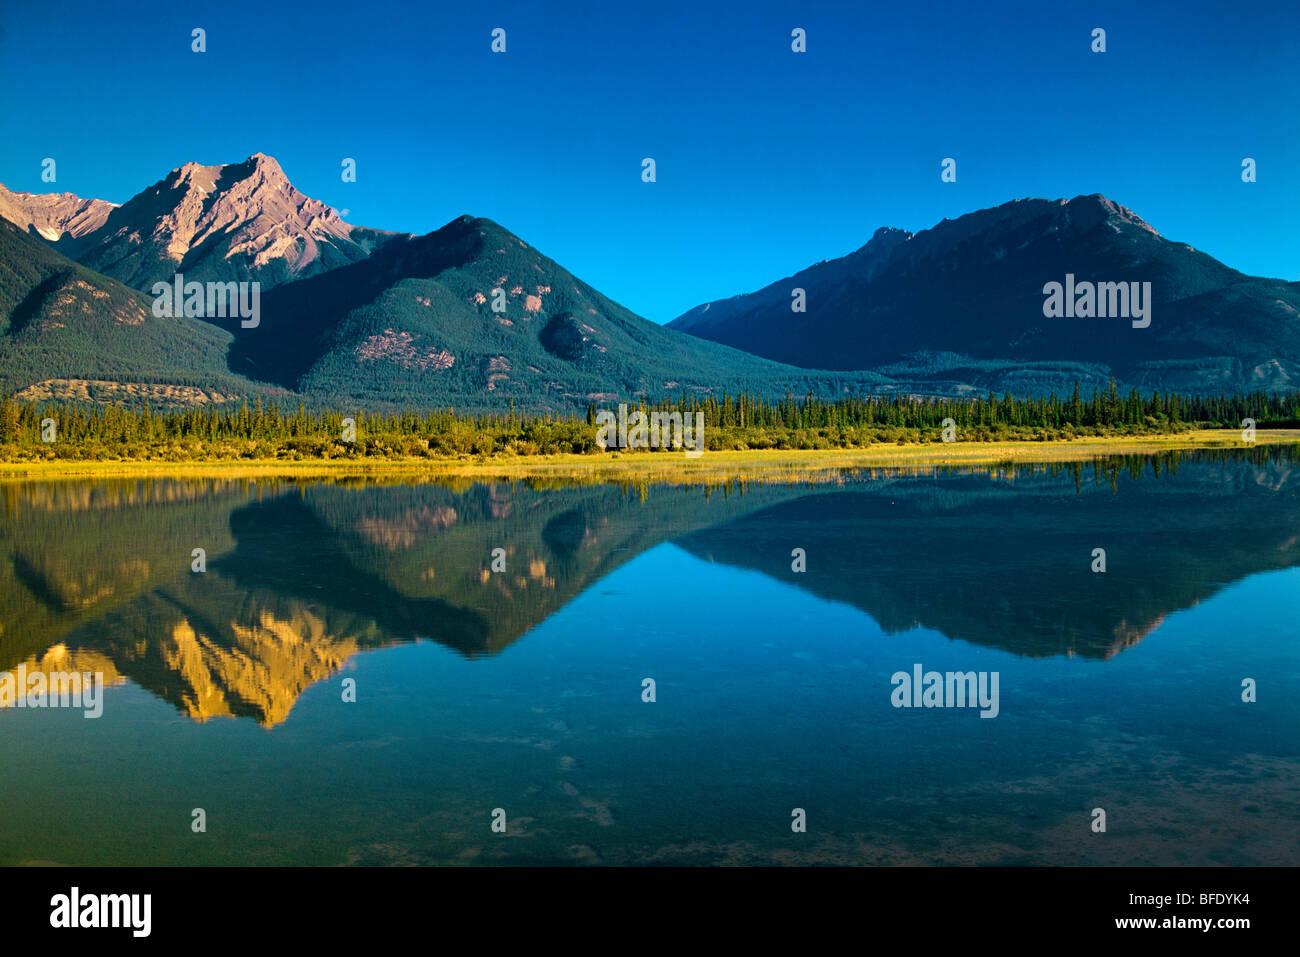 Pond near Cold Sulphur Spring, Roche de Smet at right, Jasper National Park, Alberta, Canada - Stock Image